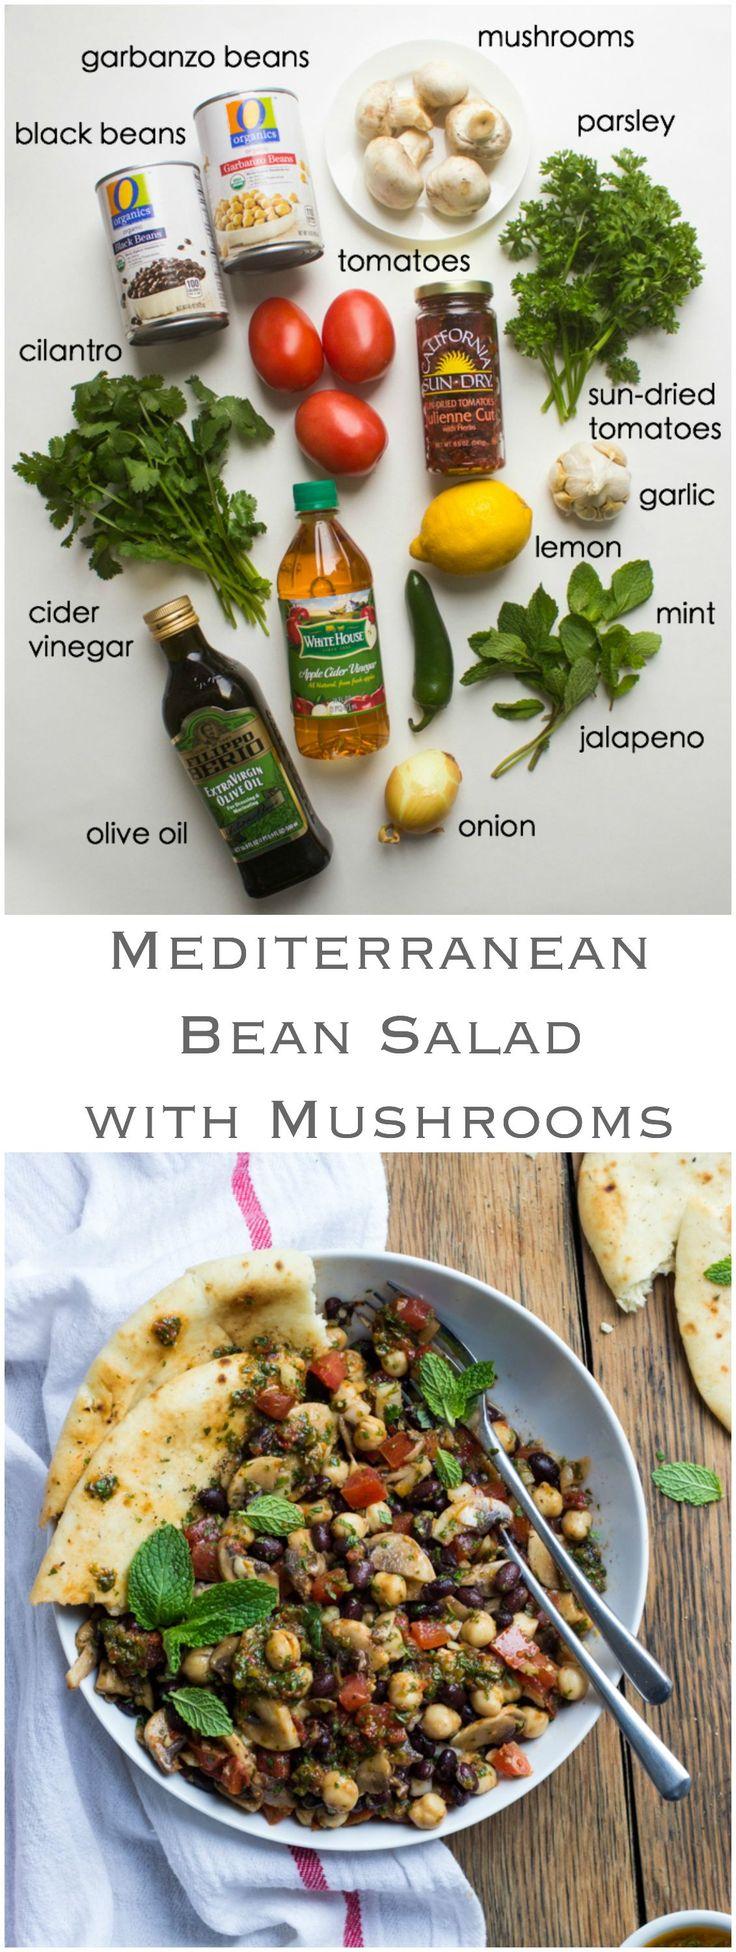 Mediterranean Bean Salad with Mushrooms - this side is a flavor bomb! So easy to make with simple ingredients. Plus it's vegetarian and vegan! | littlebroken.com @littlebroken